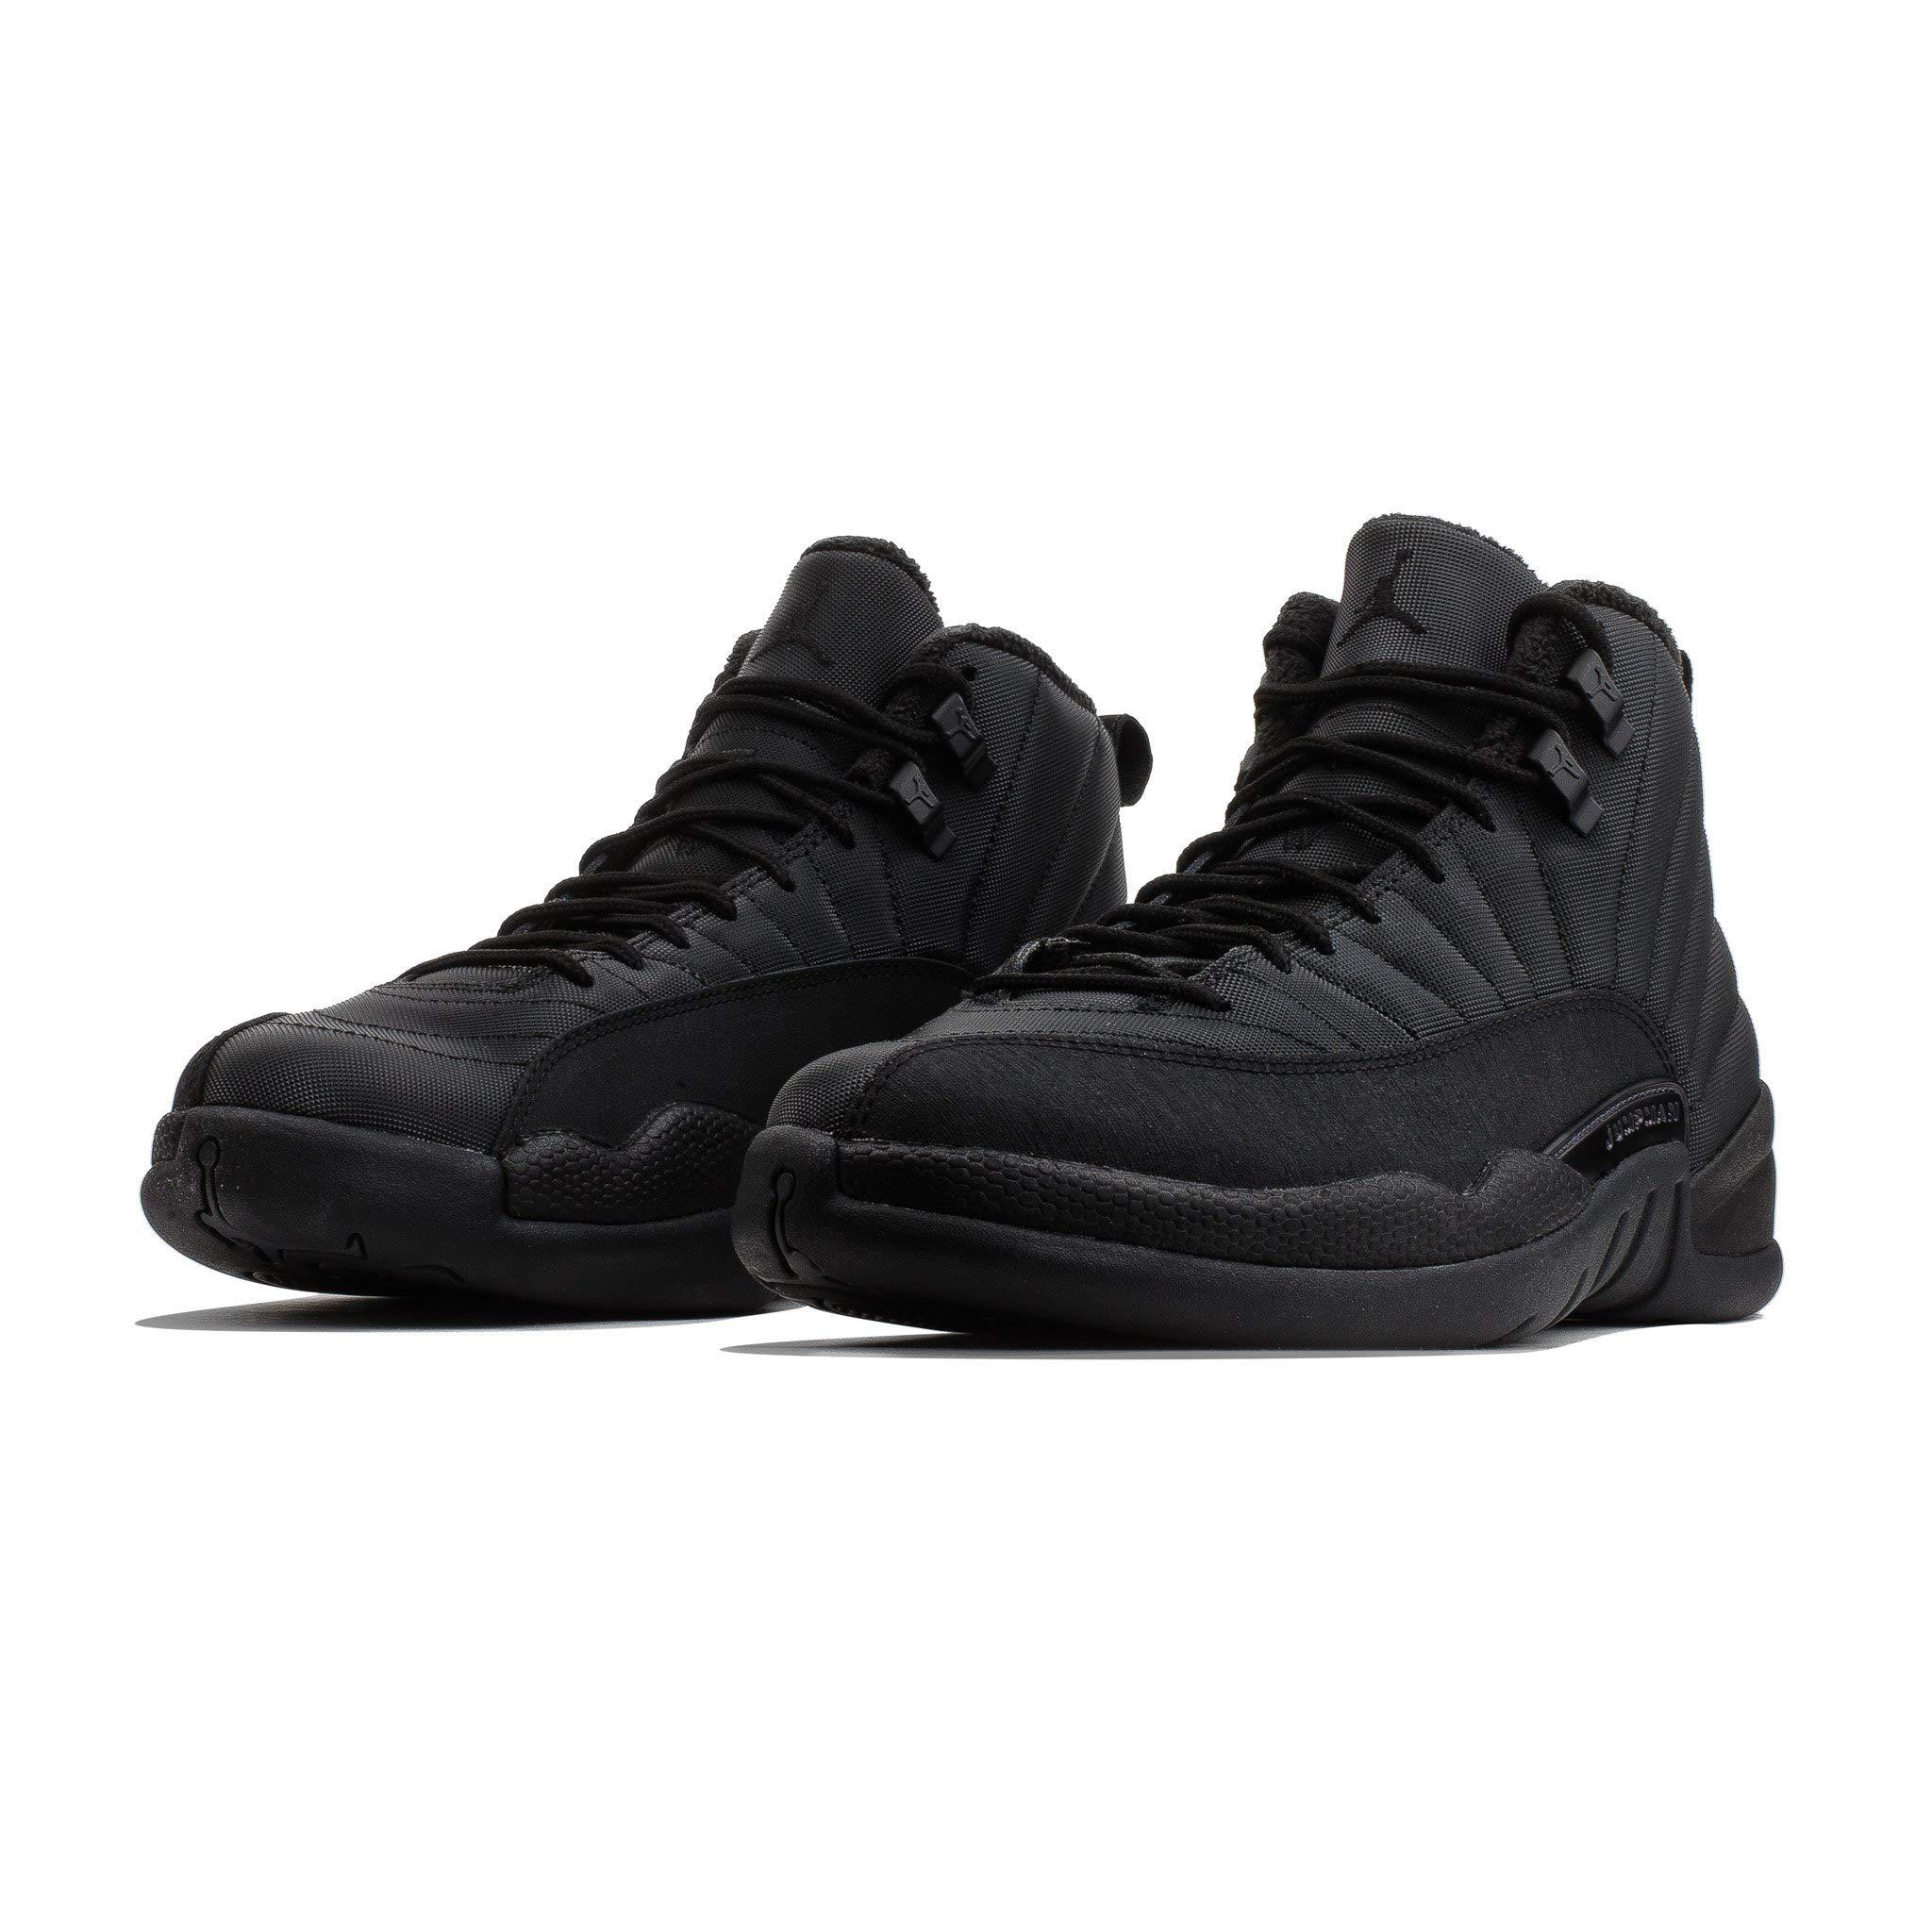 8de853ea521468 AIR Jordan 12 Winterized Triple Black BQ6851-001 US Size 7 – Premium ...